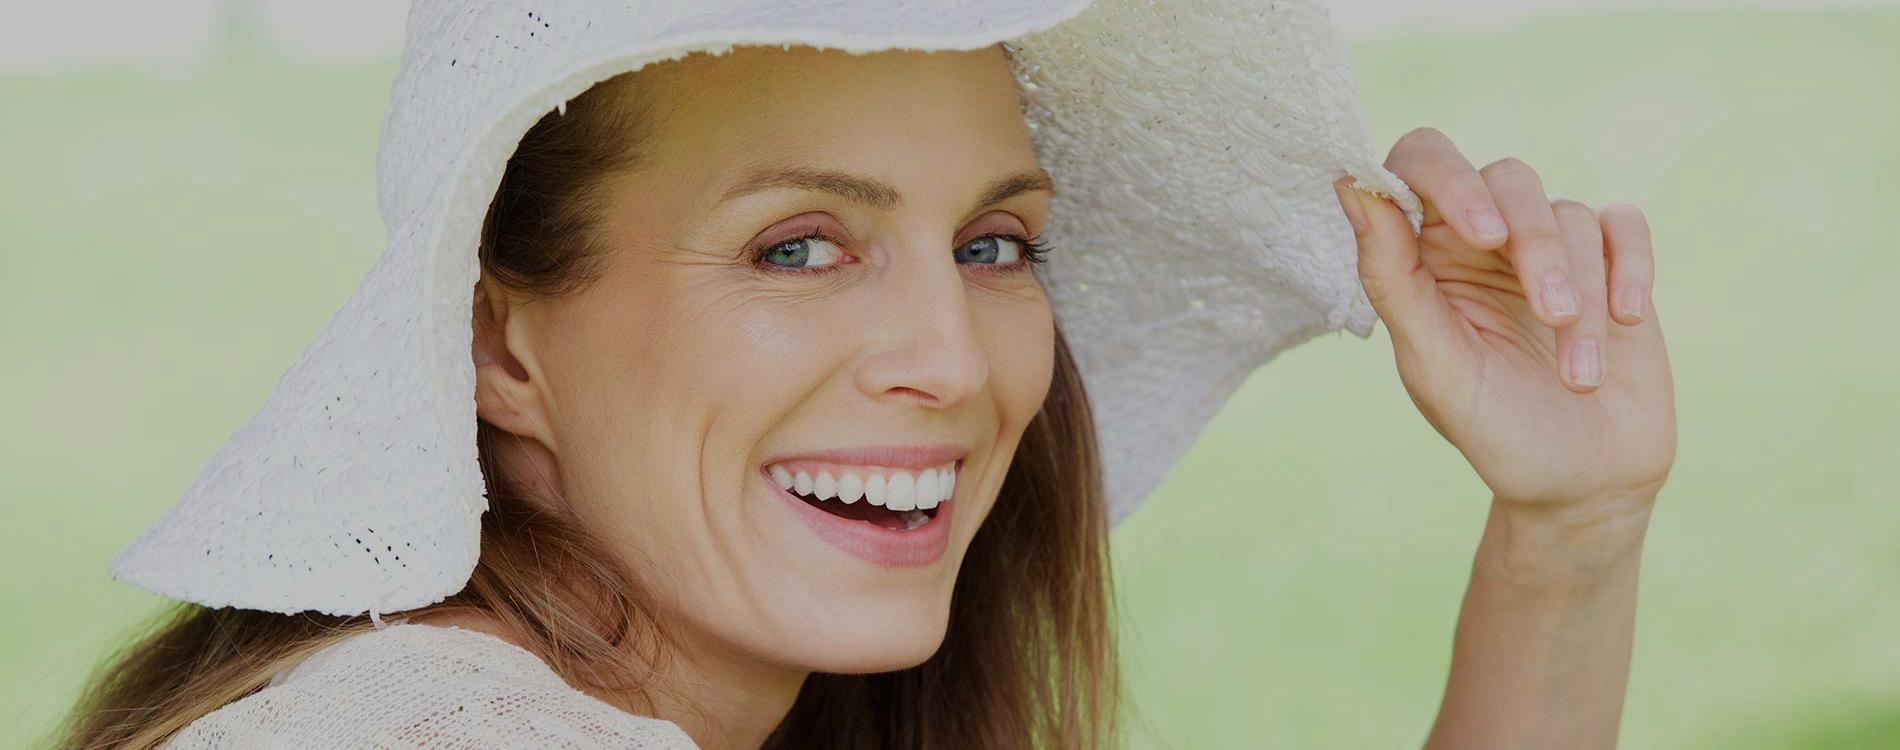 Teeth Whitening by Dr. Suffoletta